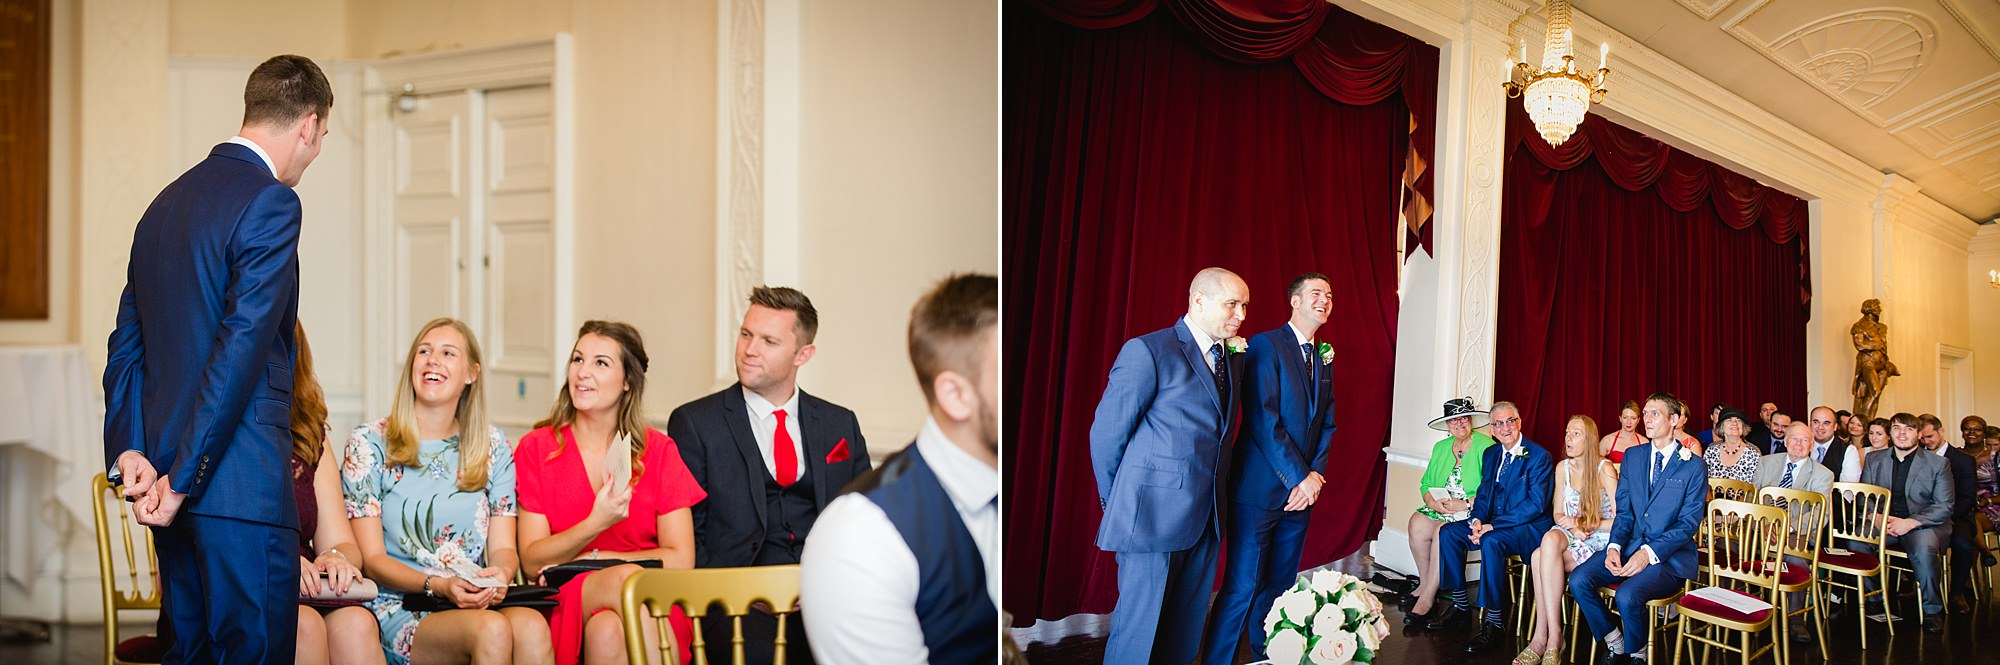 Trafalgar Tavern wedding guests before ceremony